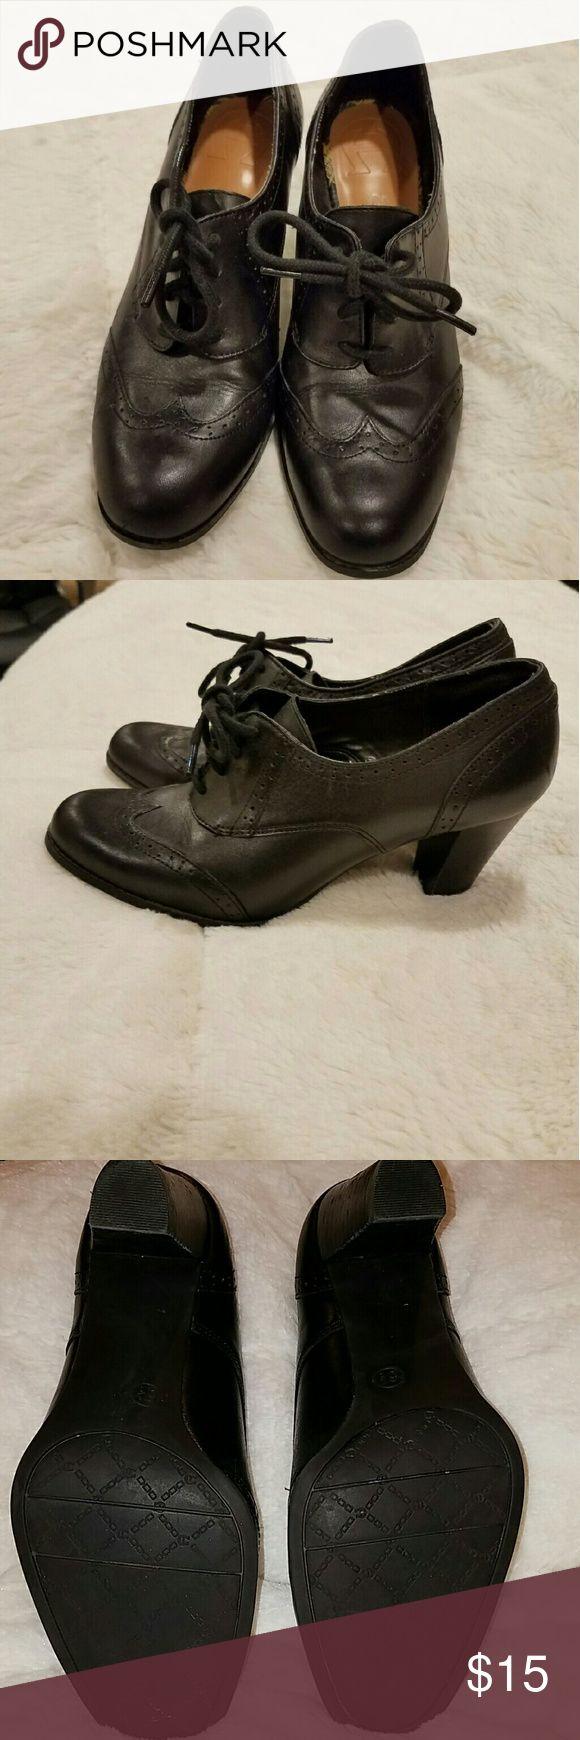 Etienne aigner black leather gloves - Aigner Women S Shoes Etienne Aignerlace Up Heelsclothing Accessoriesoxfordswomen S Shoesblack Leather